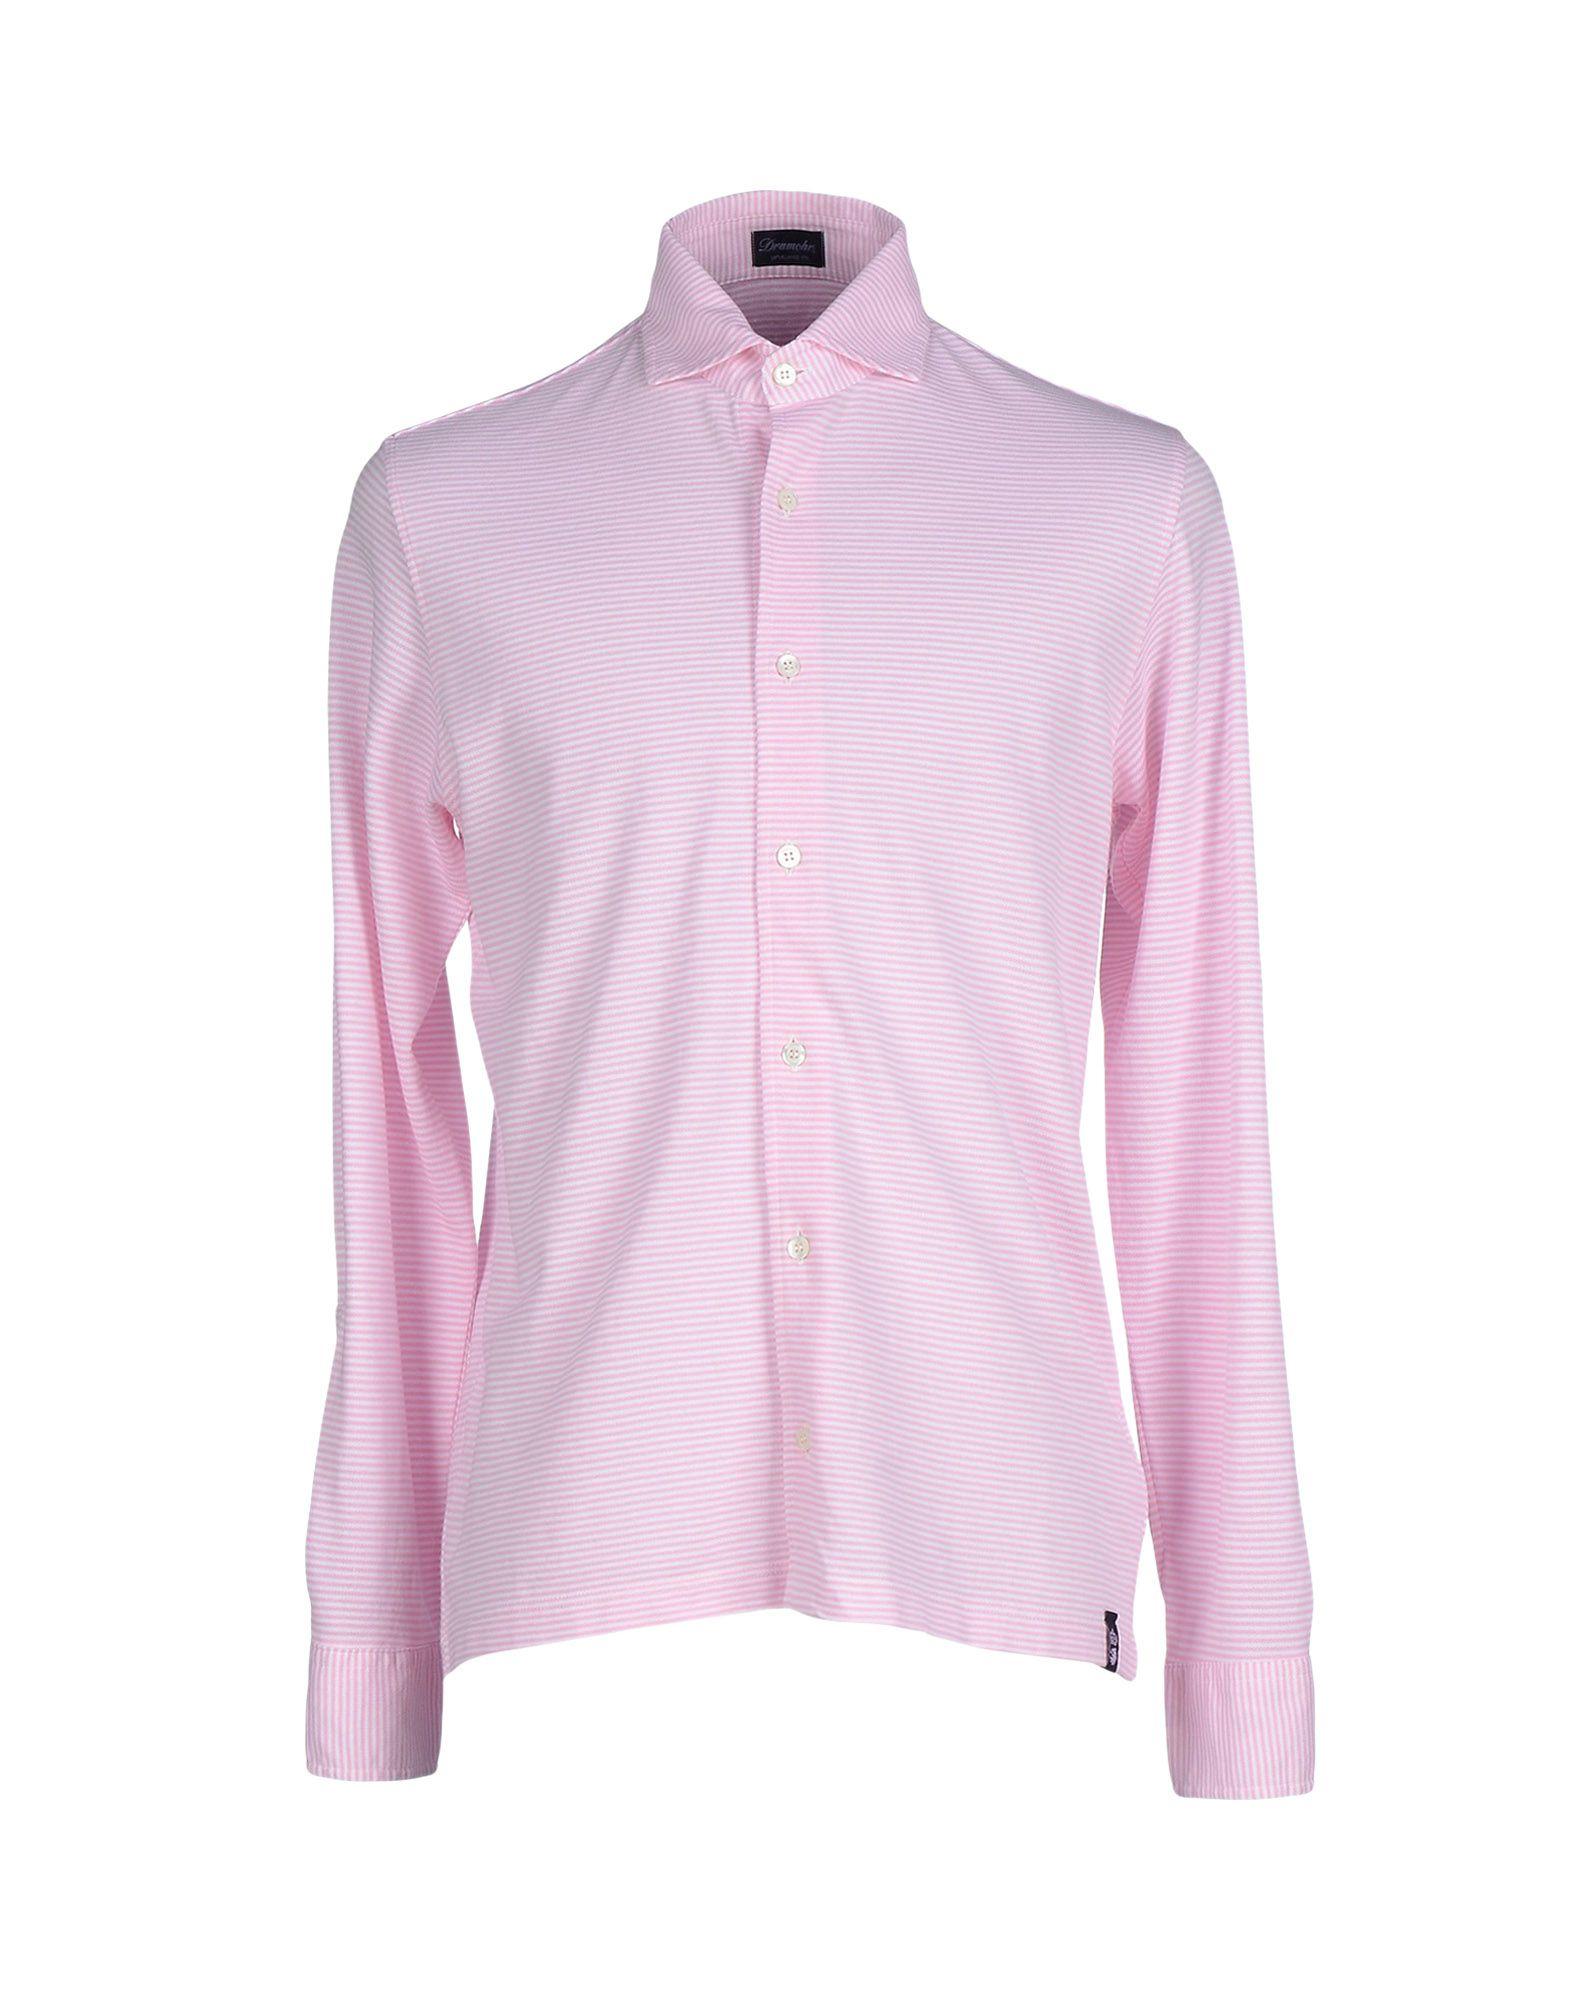 Lyst drumohr shirt in pink for men for Mens pink shirts uk